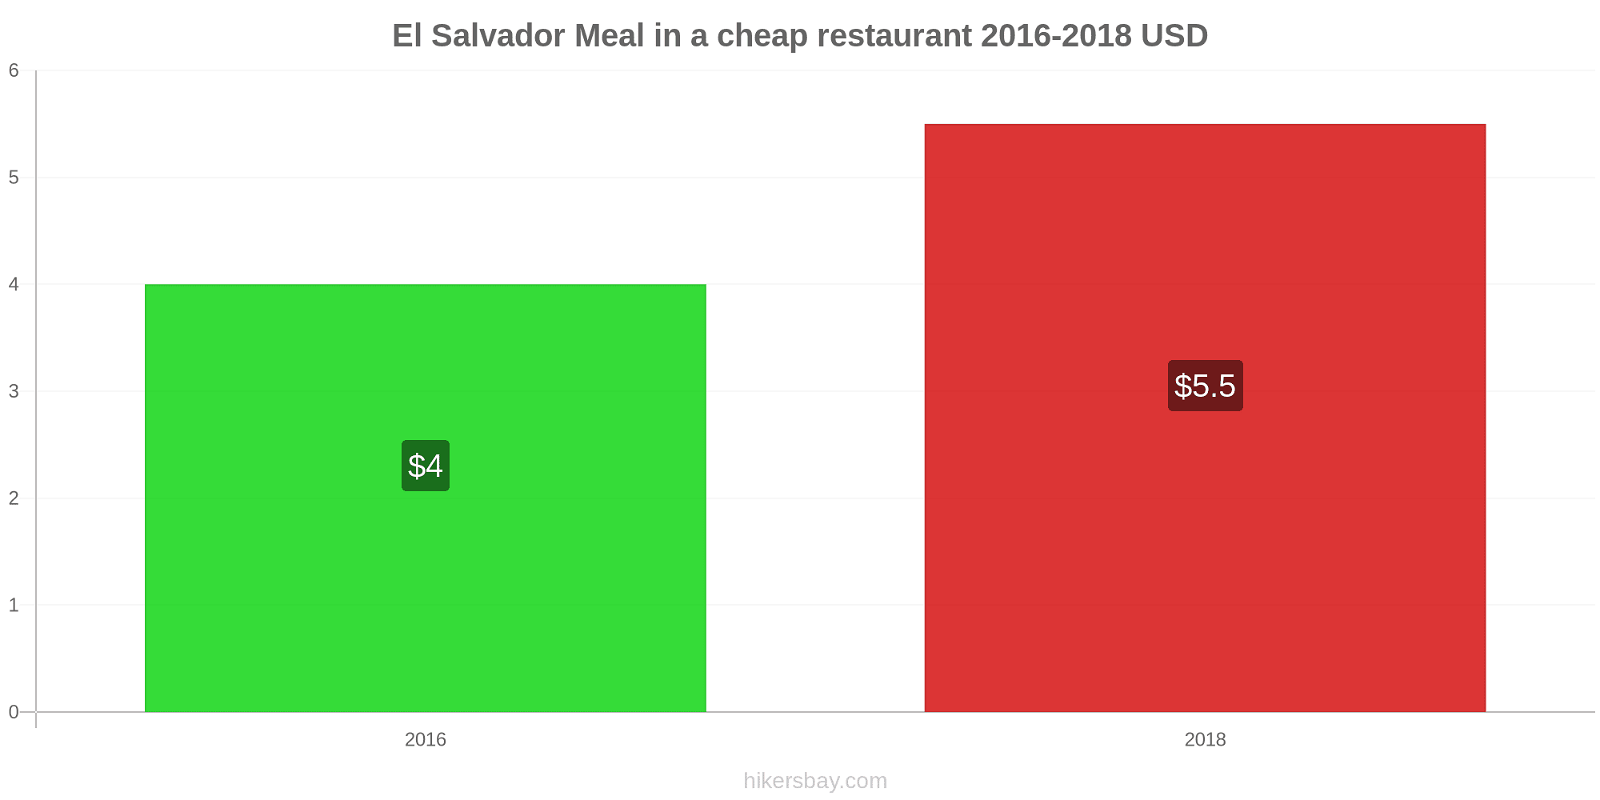 El Salvador price changes Meal in a cheap restaurant hikersbay.com